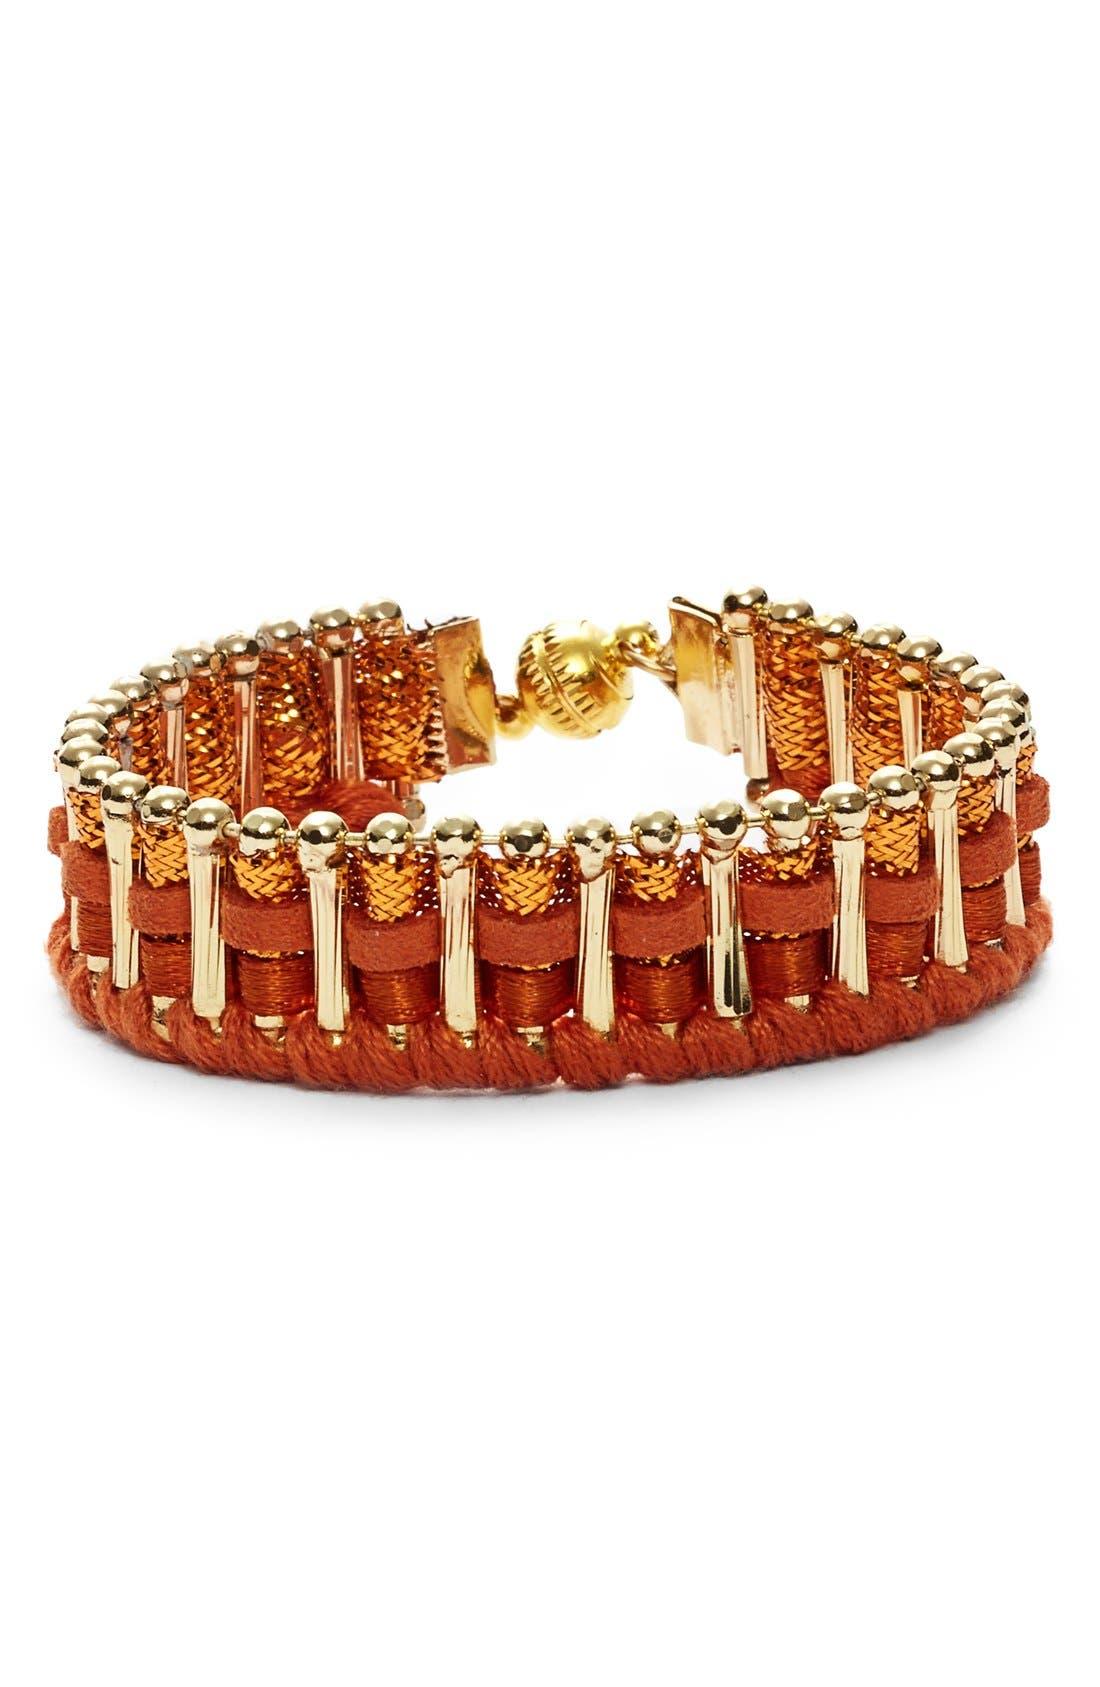 NORDSTROM,                             Woven Bracelet,                             Main thumbnail 1, color,                             200